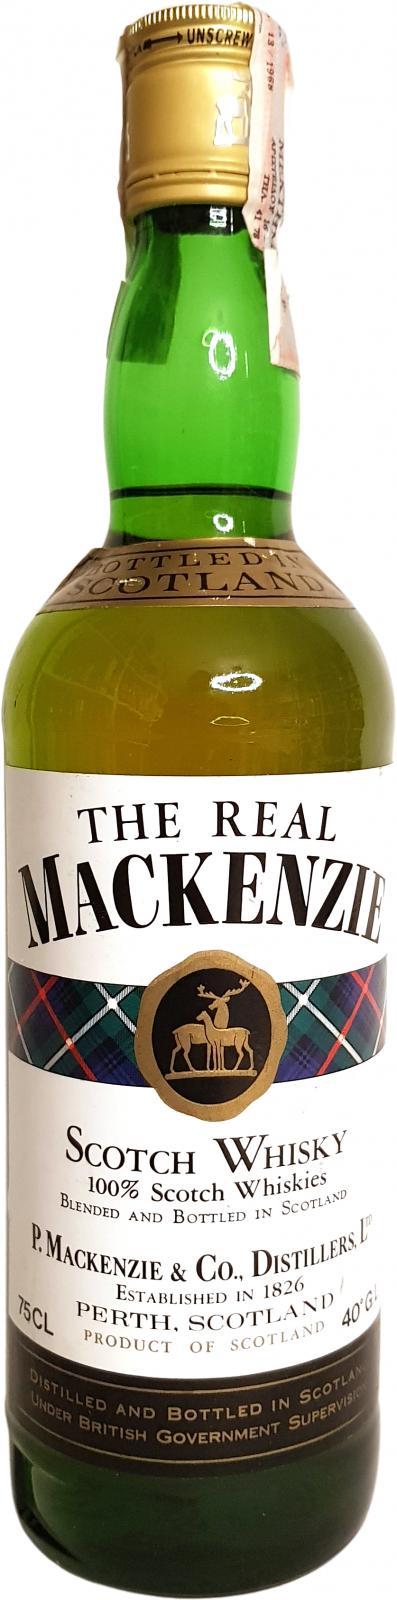 The Real Mackenzie Scotch Whisky